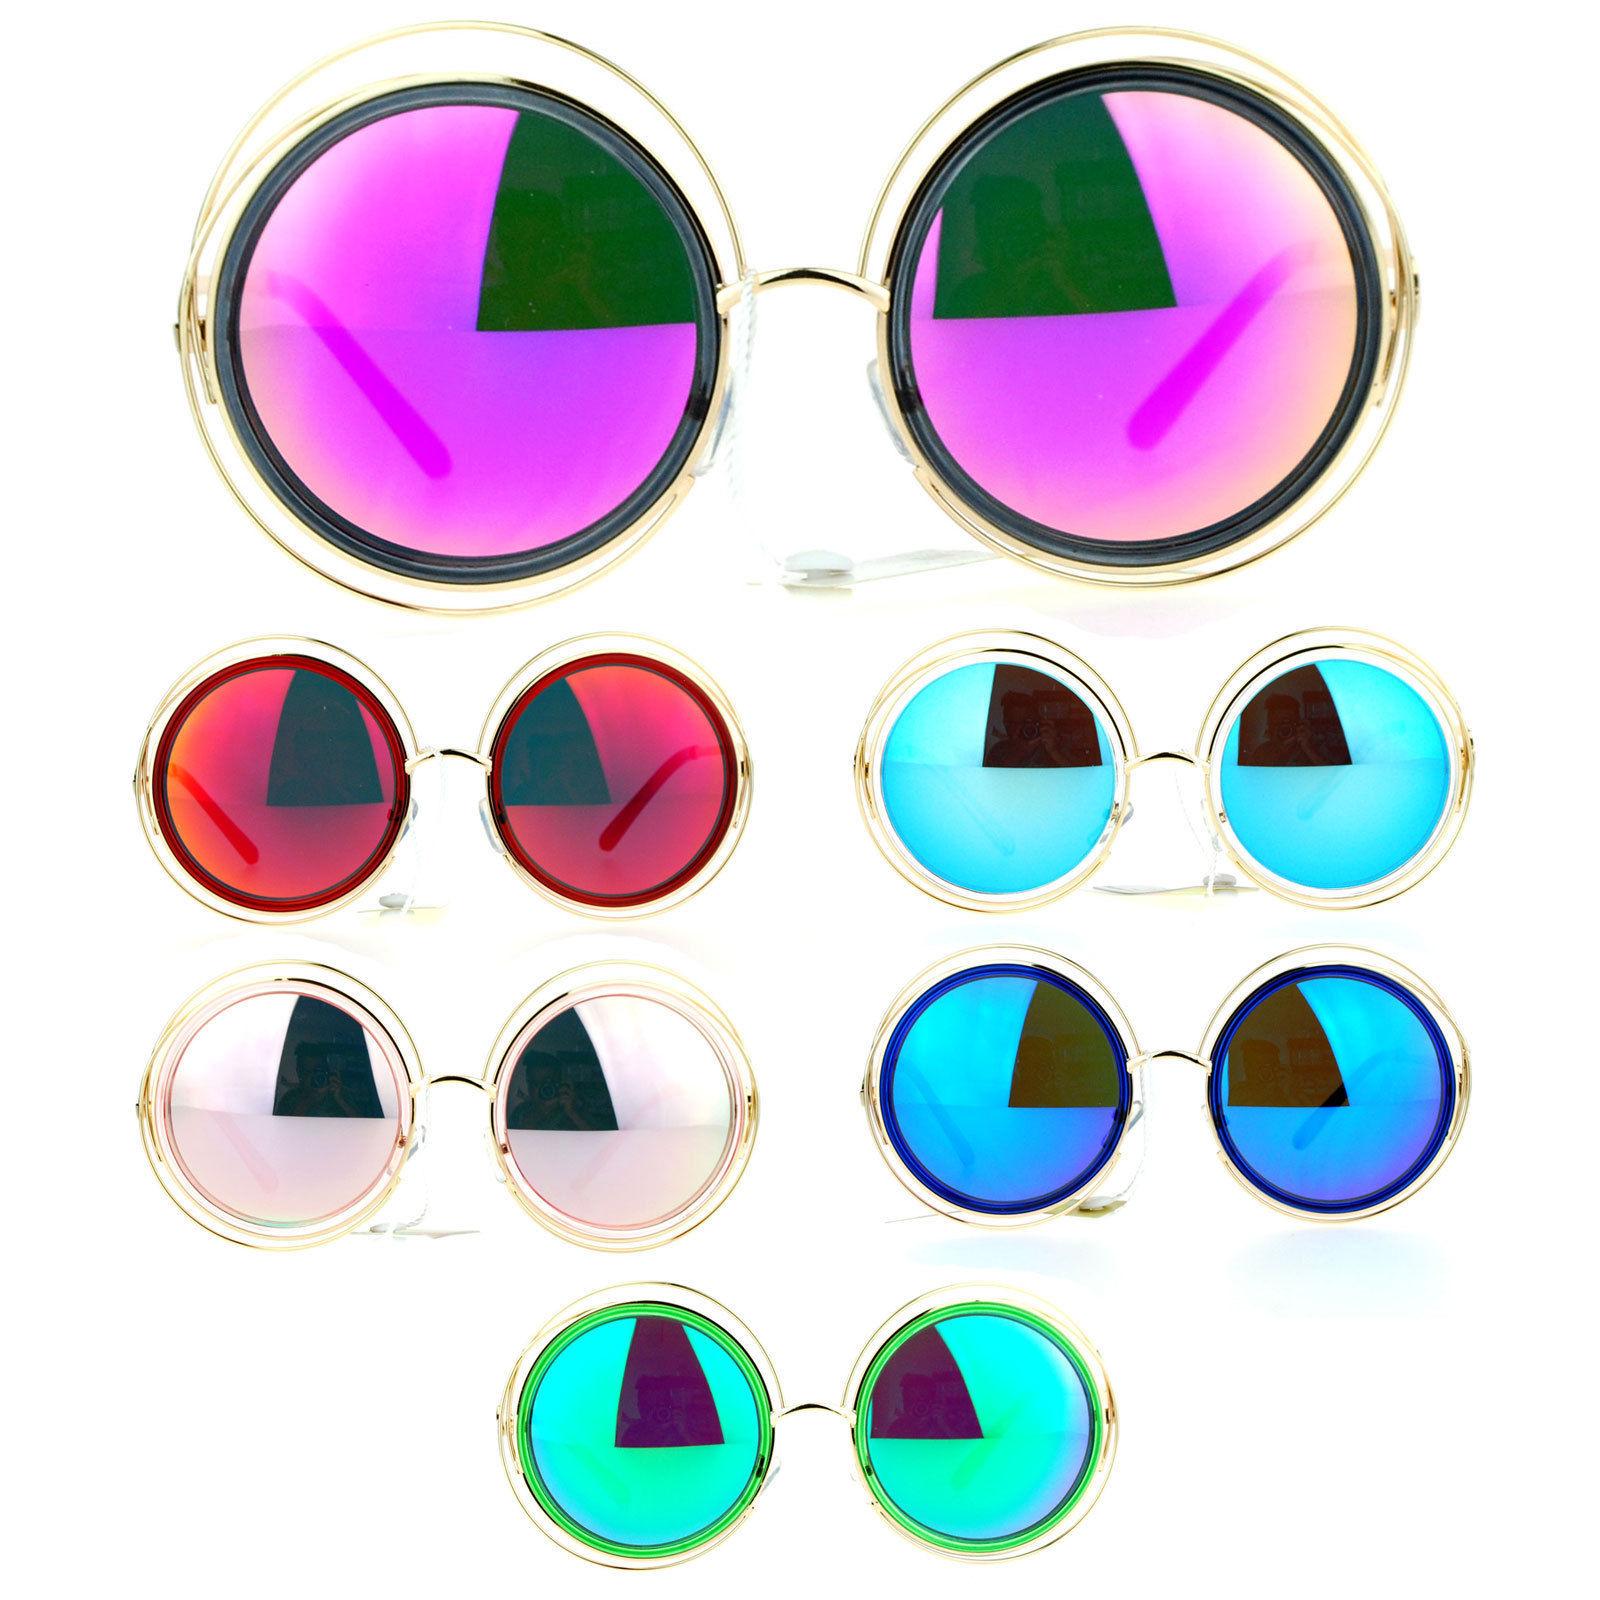 dcef7afa828c3 S l1600. S l1600. Previous. SA106 Double Scribble Frame Round Circle  Mirrored Lens Retro Sunglasses. SA106 Double Scribble Frame ...